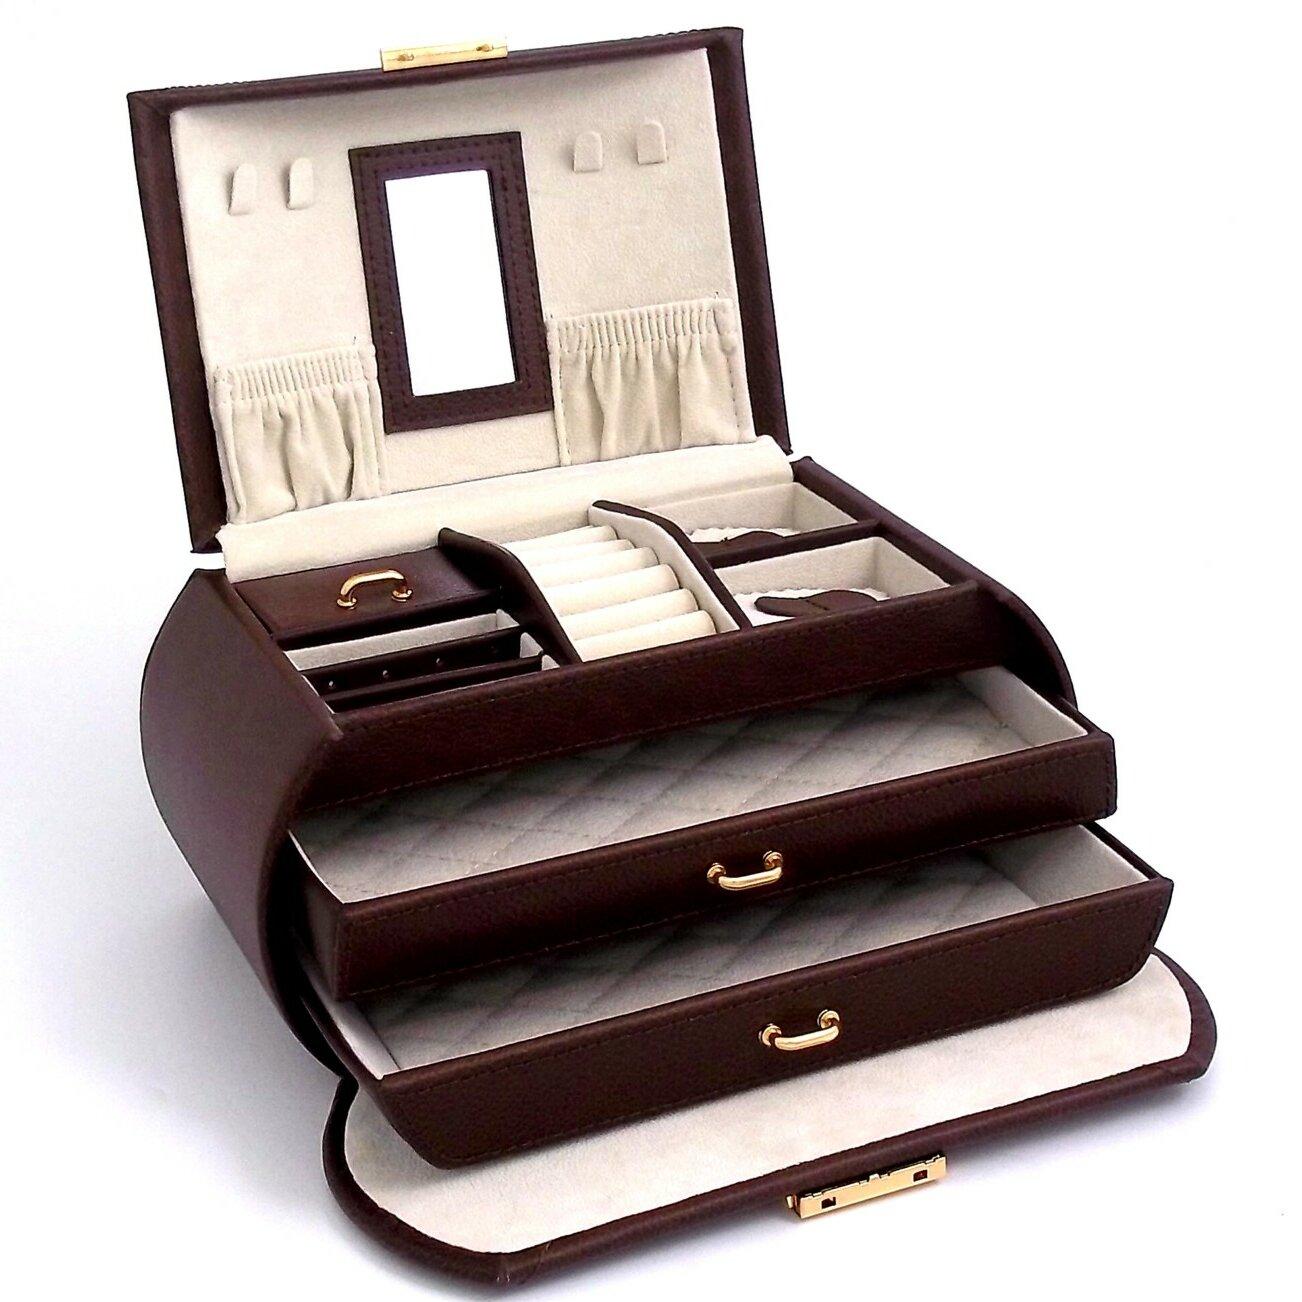 Bey berk multi level jewelry box for Bey berk jewelry box